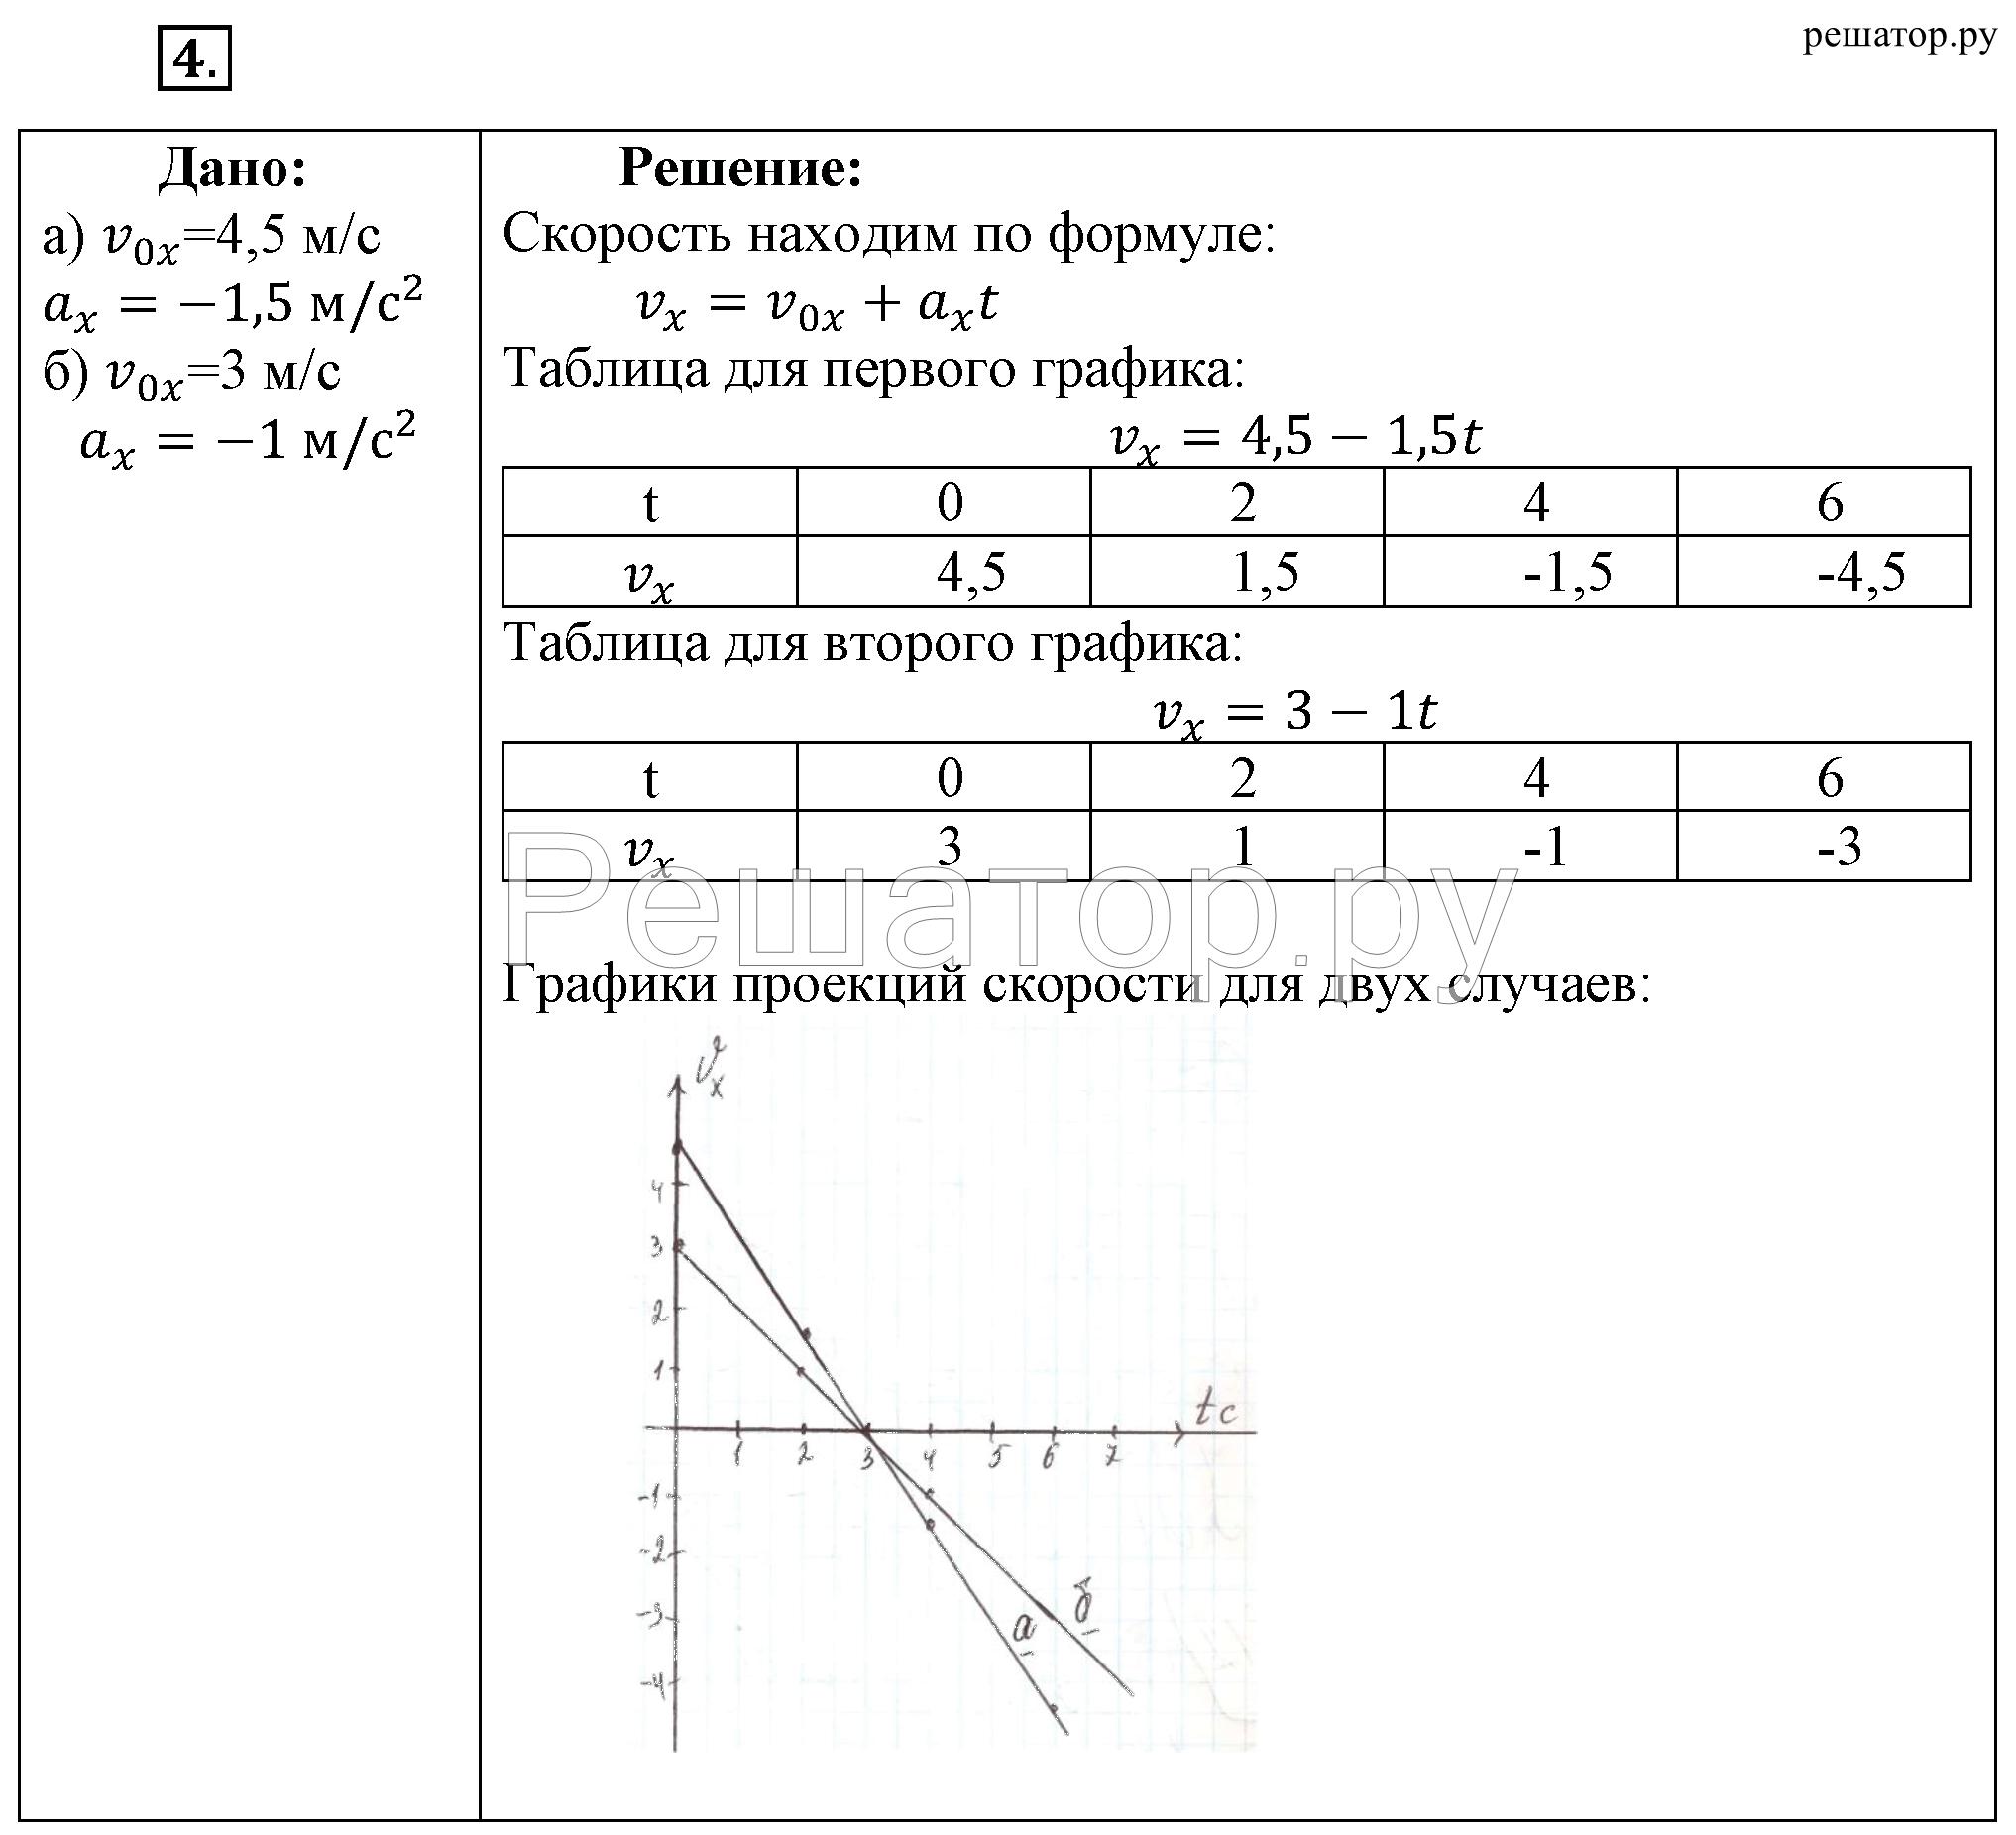 решебник по учебнику по физике упражнение